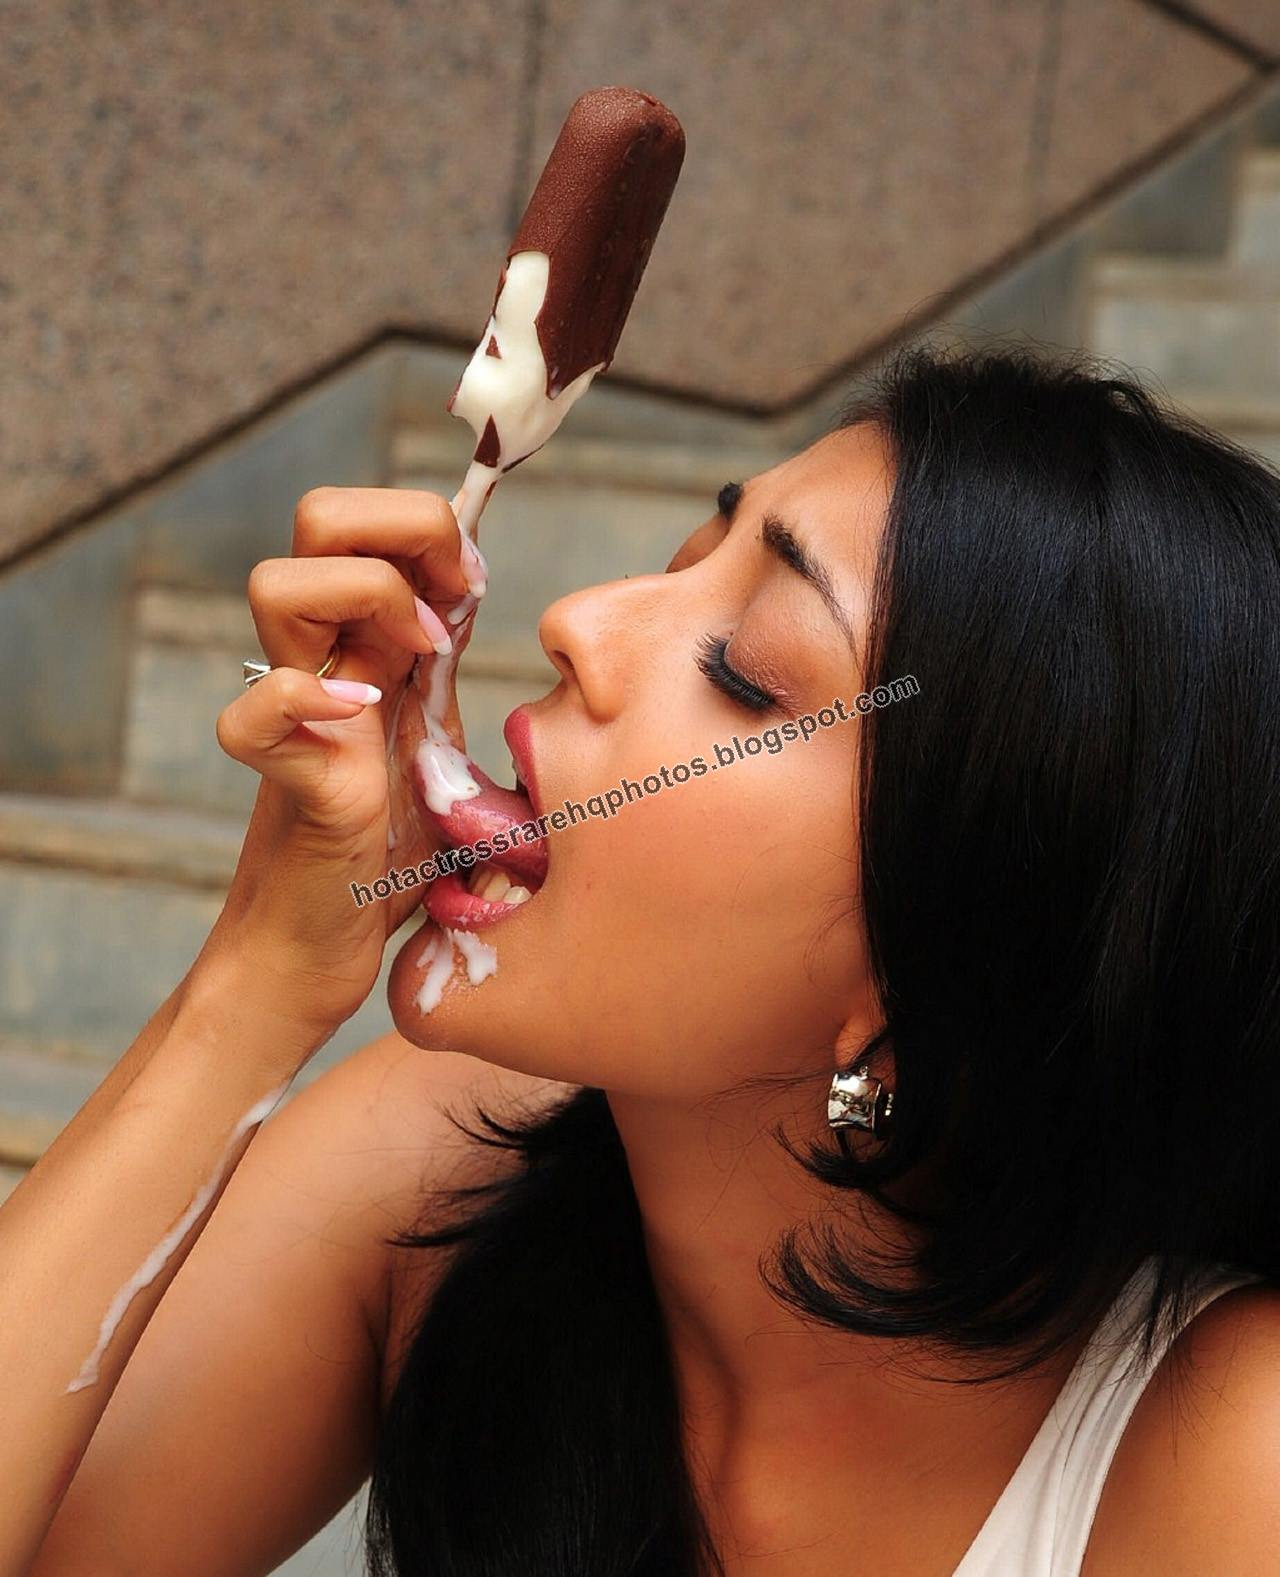 Shall Hot indian girl kissing penis consider